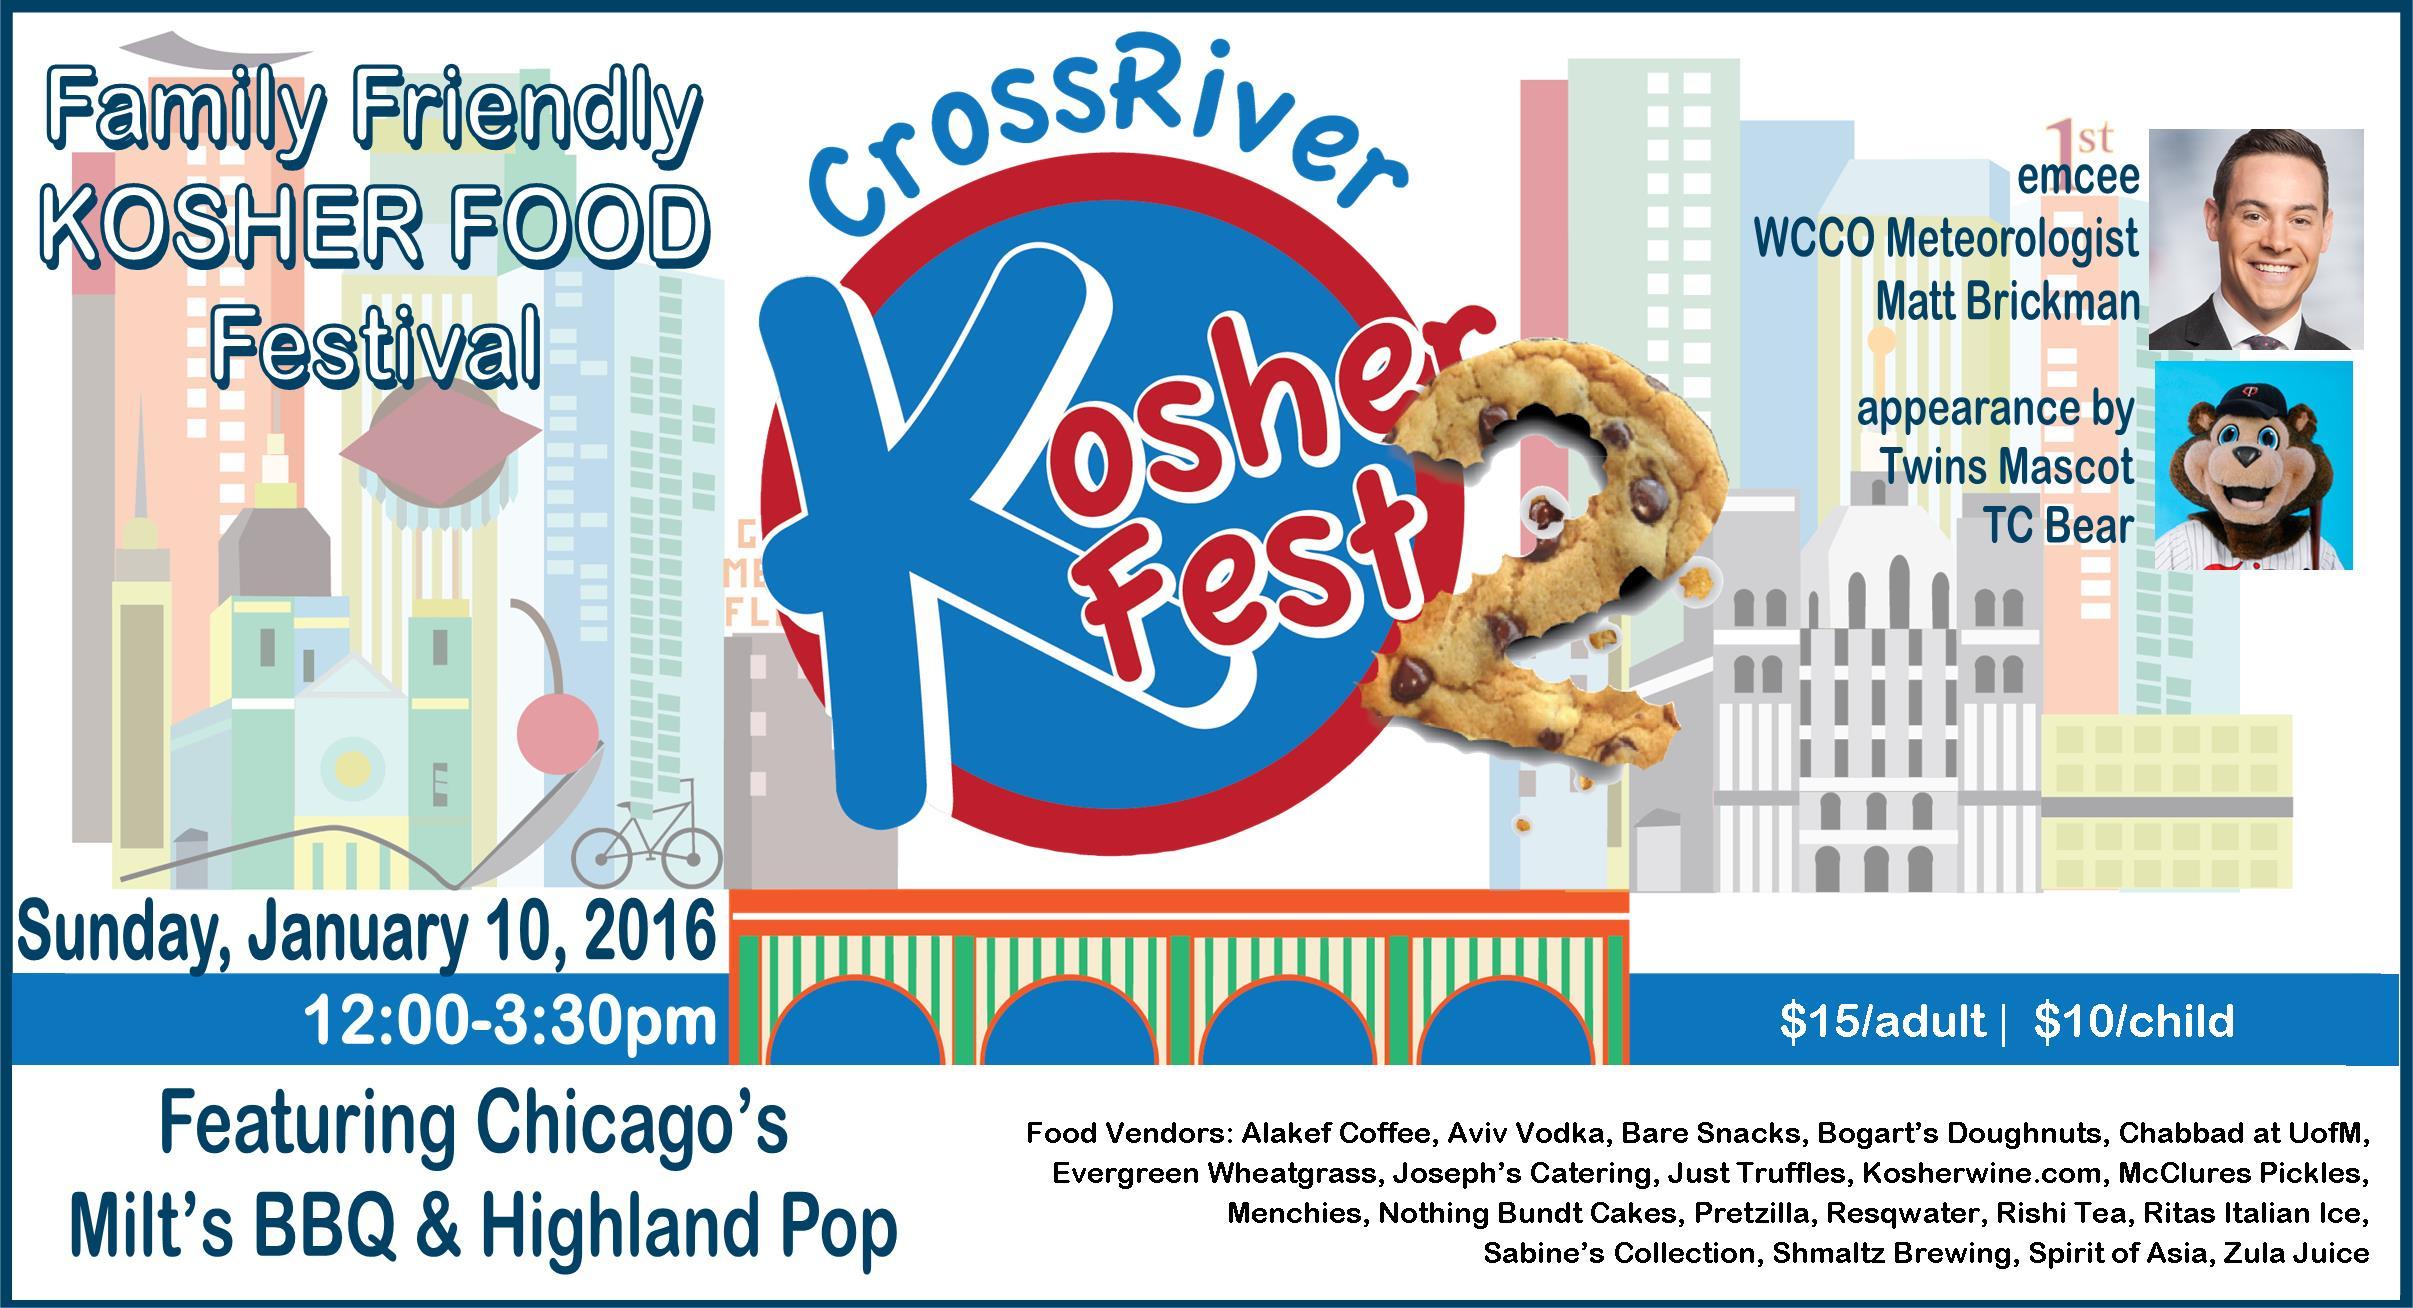 2nd Annual CrossRiver KosherFest Food Festival